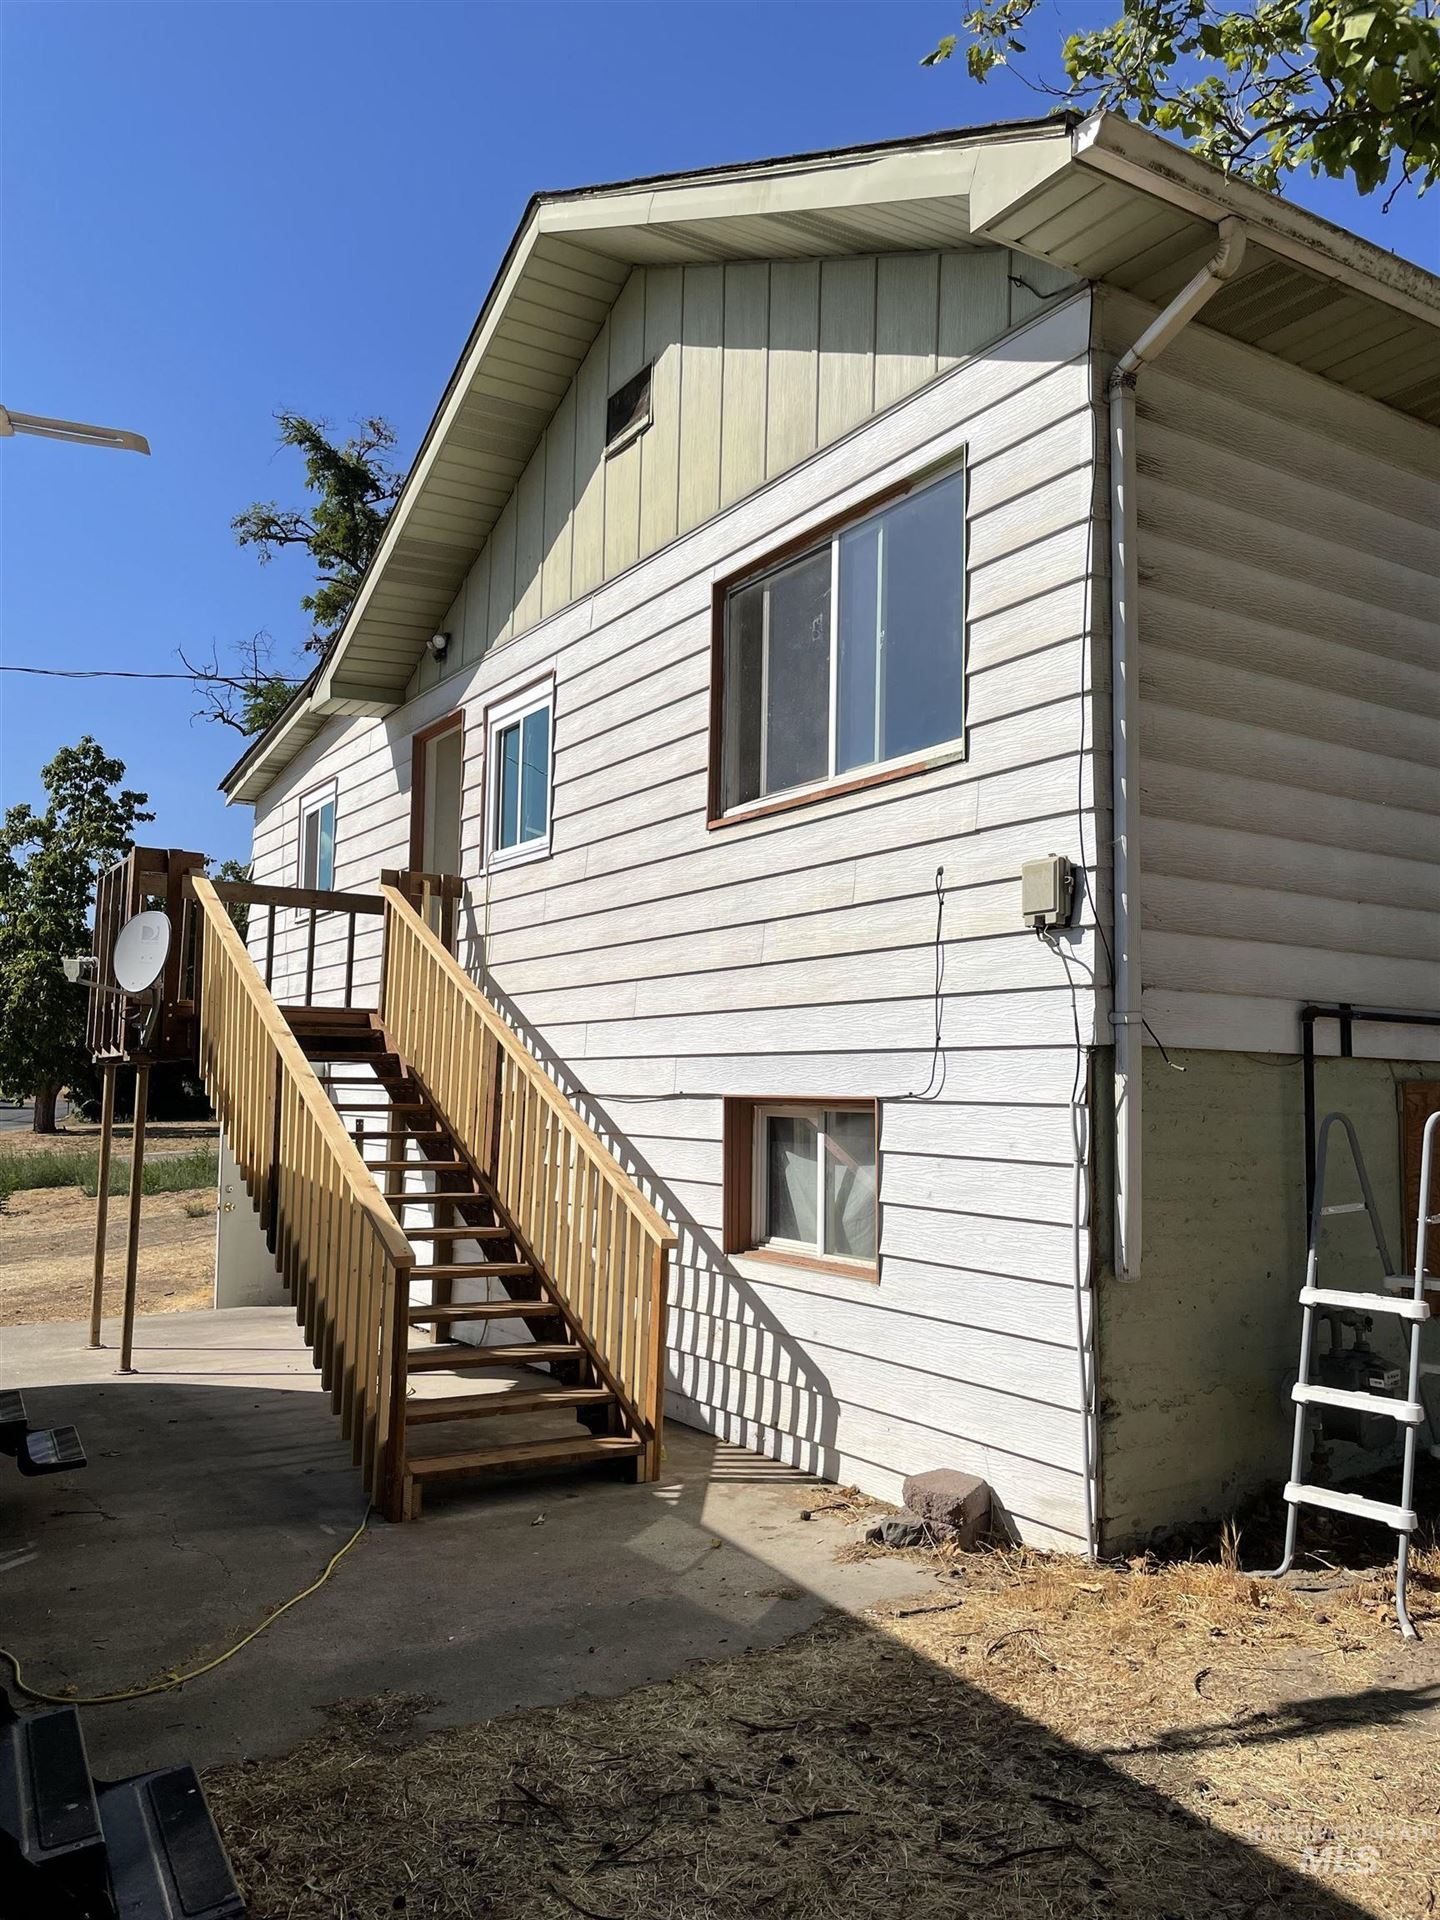 Photo of 1130 20th Ave., Clarkston, WA 99403 (MLS # 98818872)